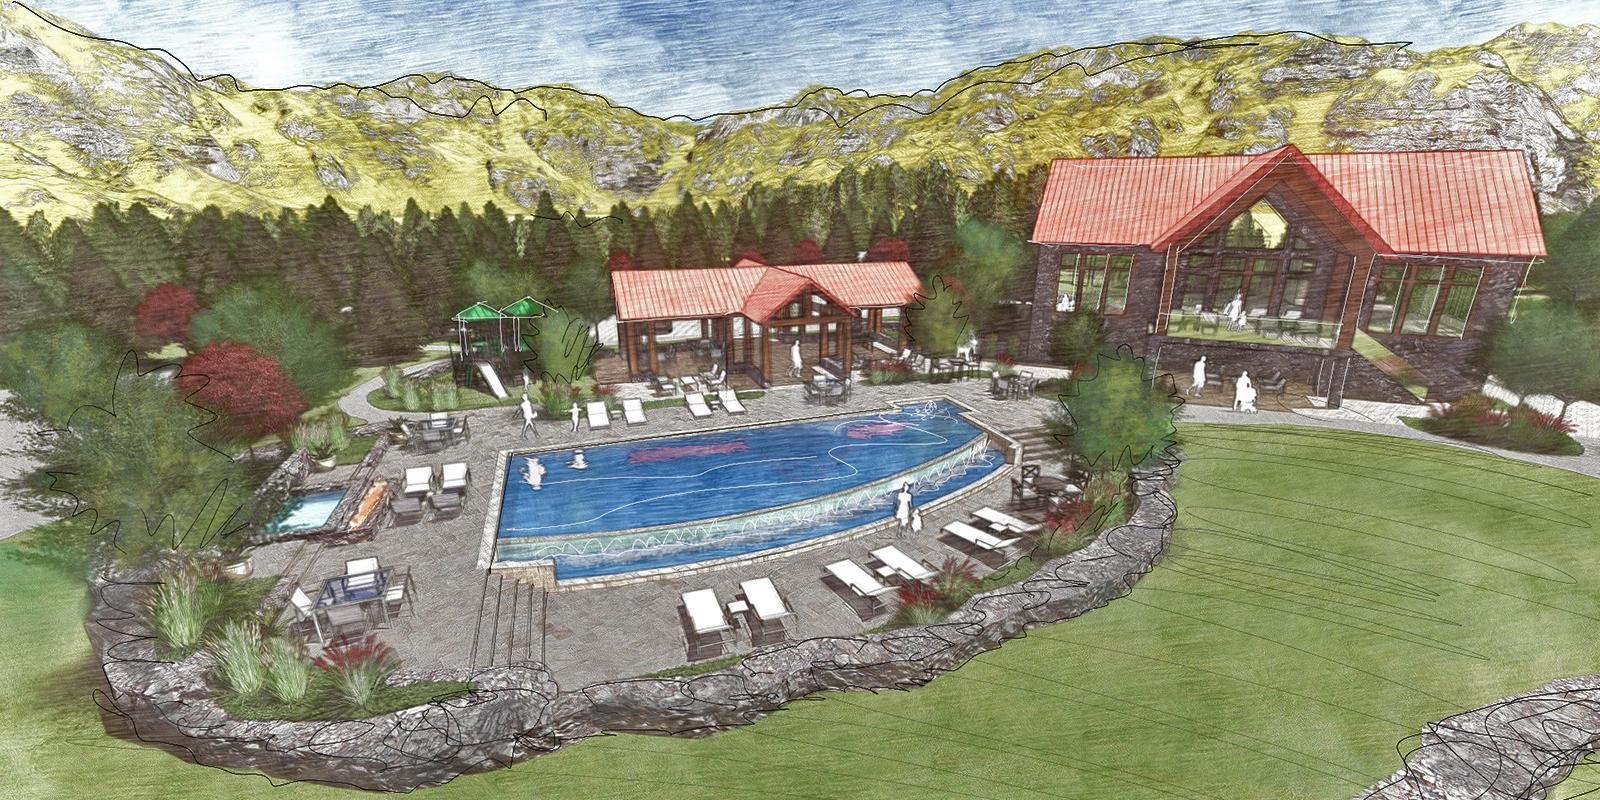 ELK PARK RANCH - Resident pool & amenity center